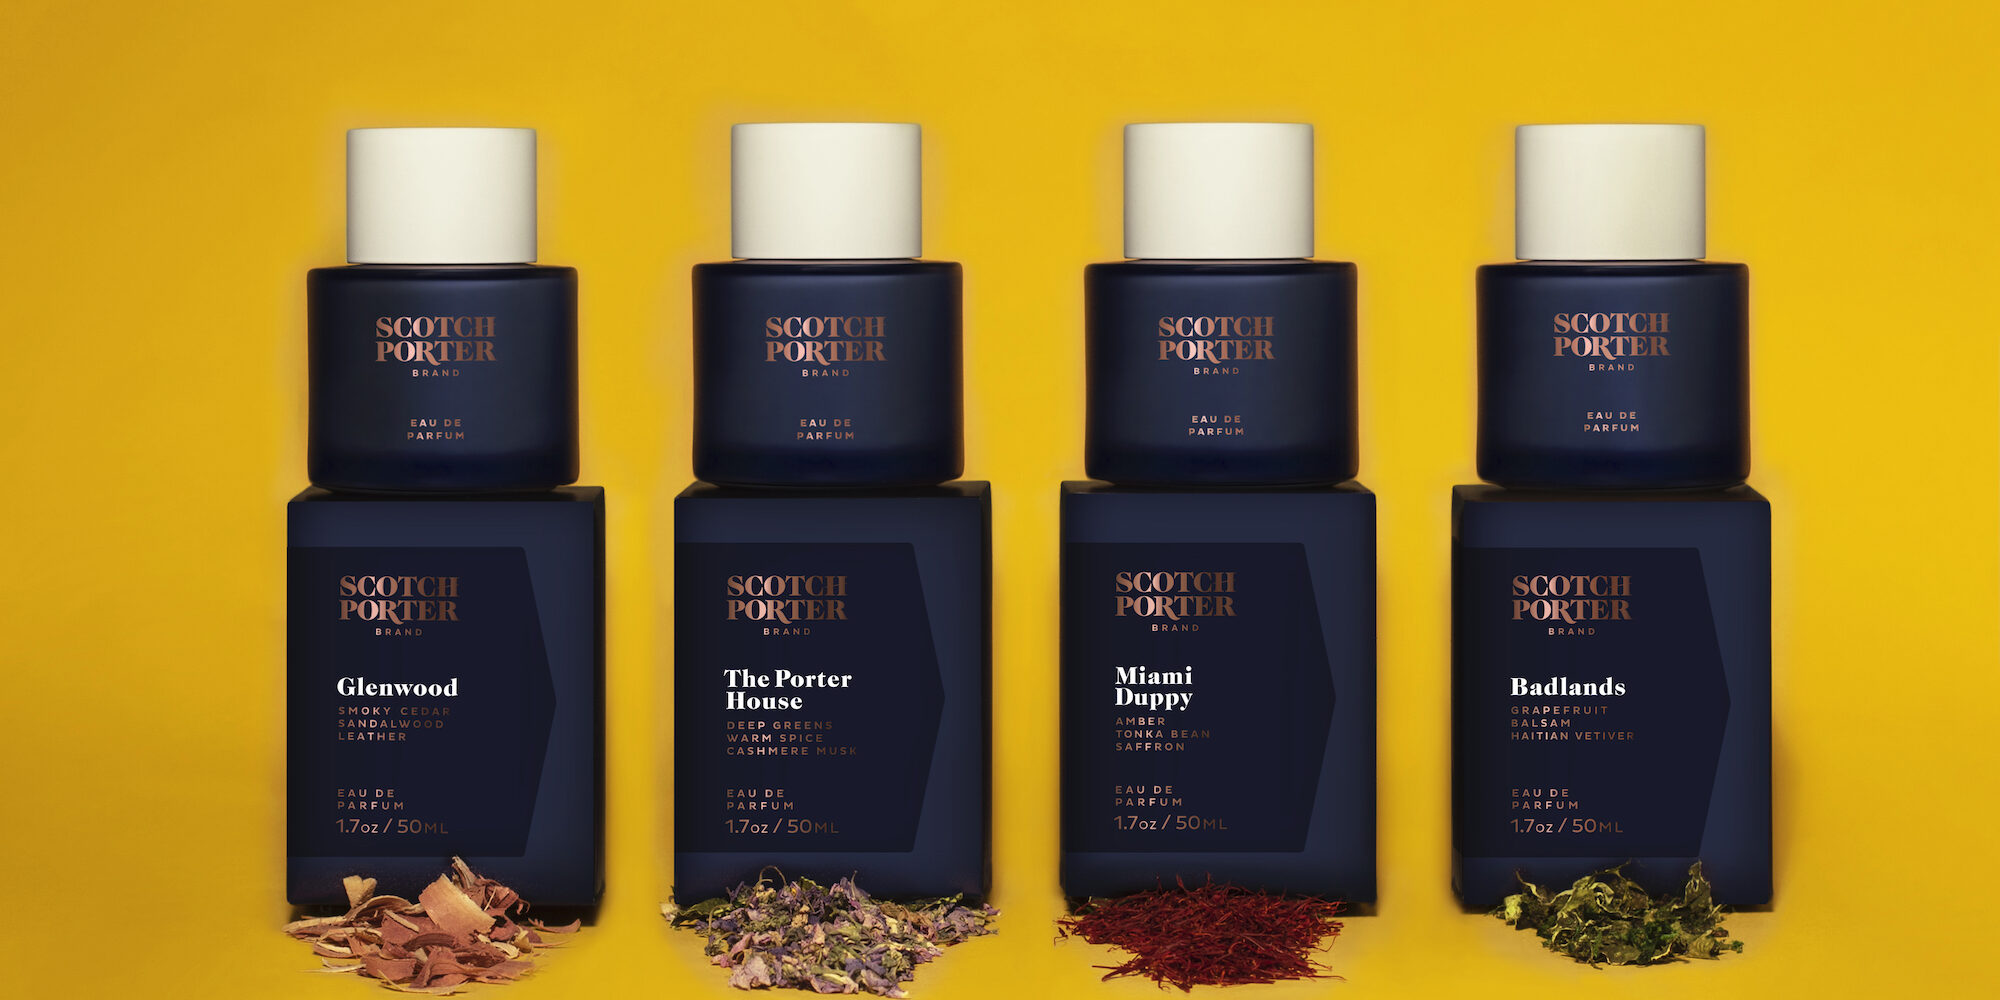 Meet The Entrepreneurs Diversifying The Fragrance Industry